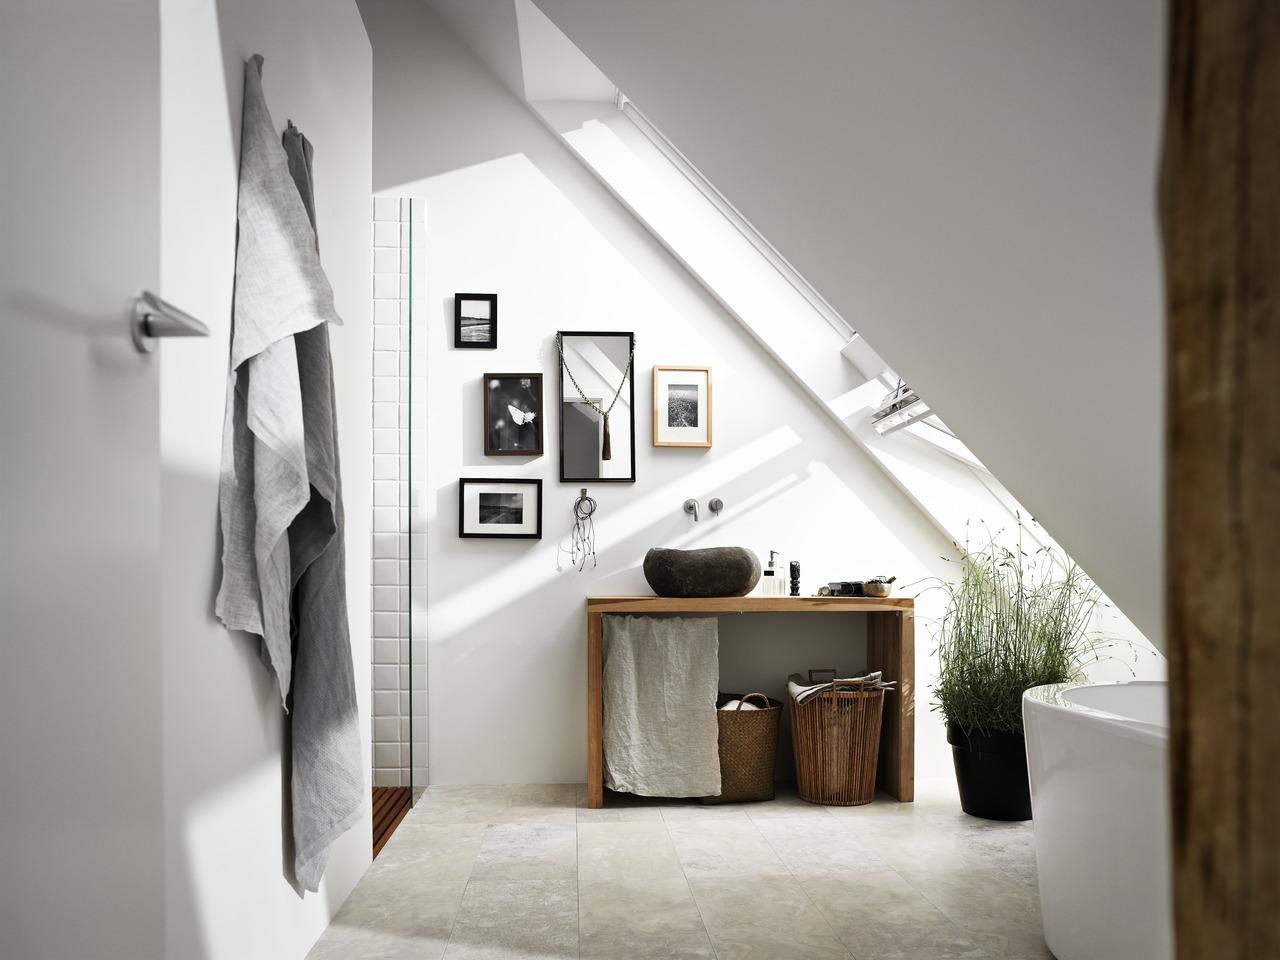 4 idee per ricavare spazio in bagno - Bagno in mansarda non abitabile ...